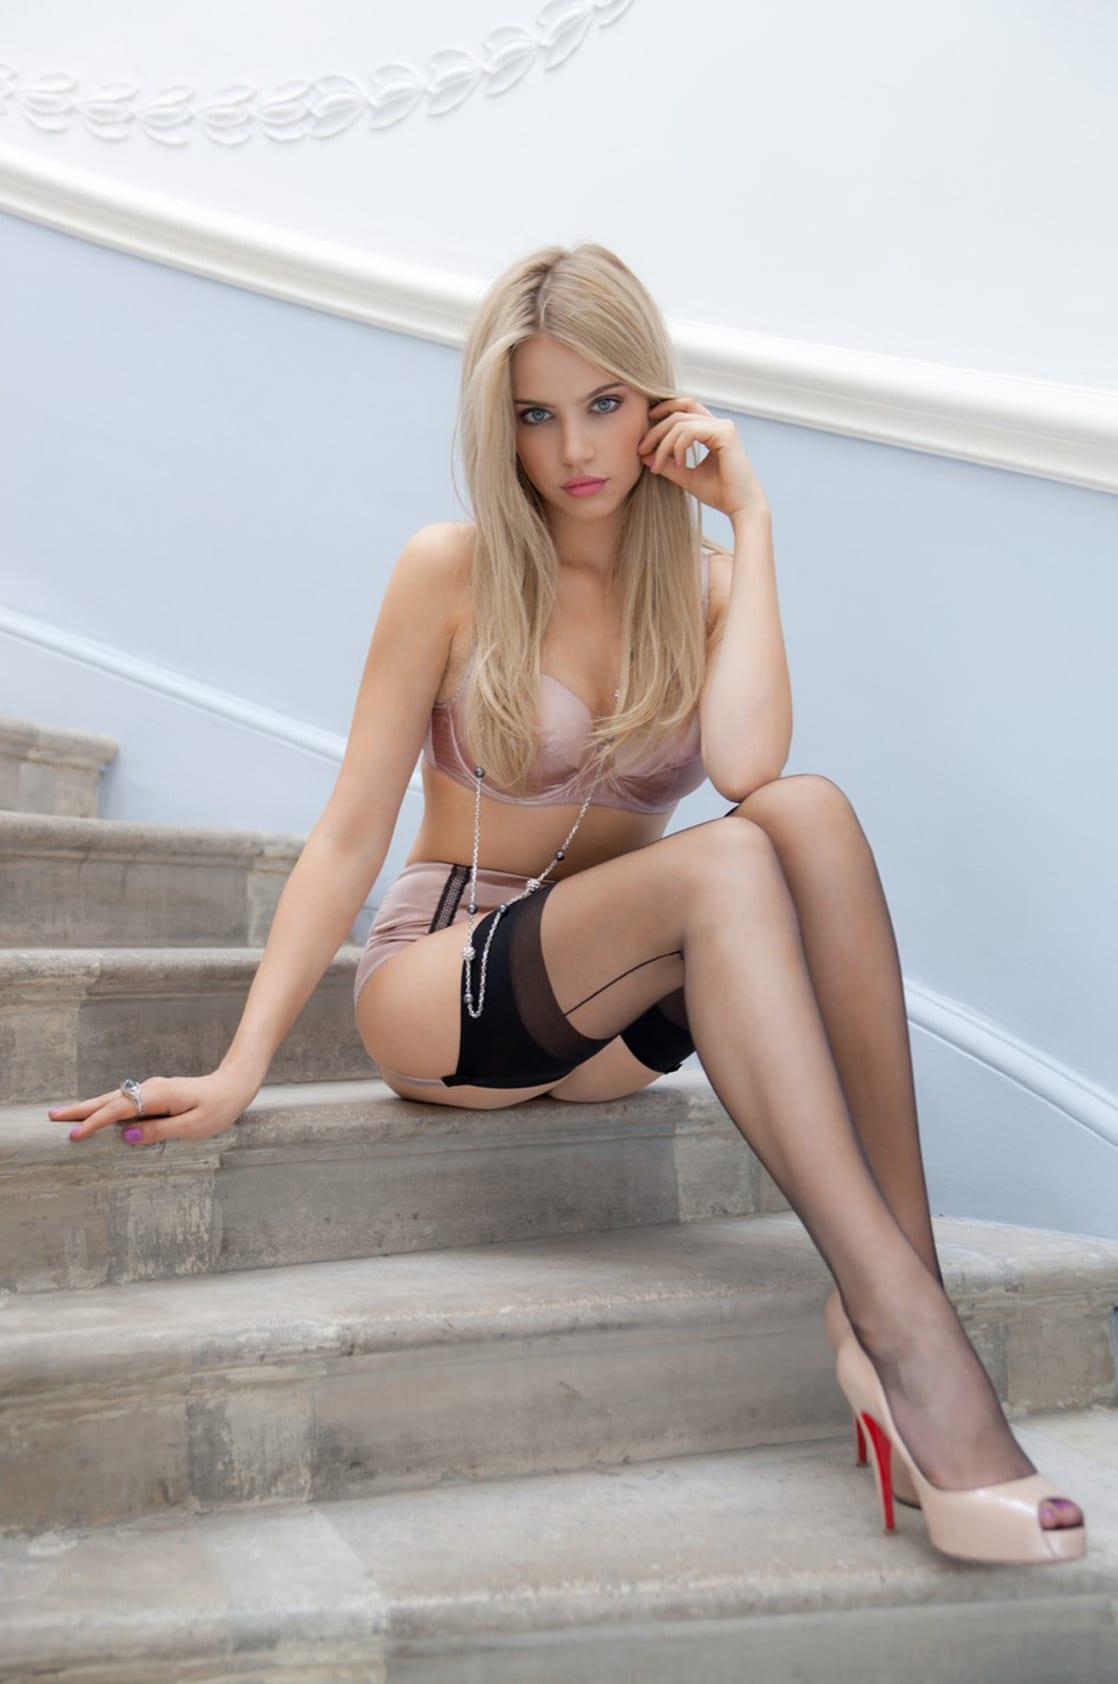 Consider, that Xenia tchoumitcheva lingerie